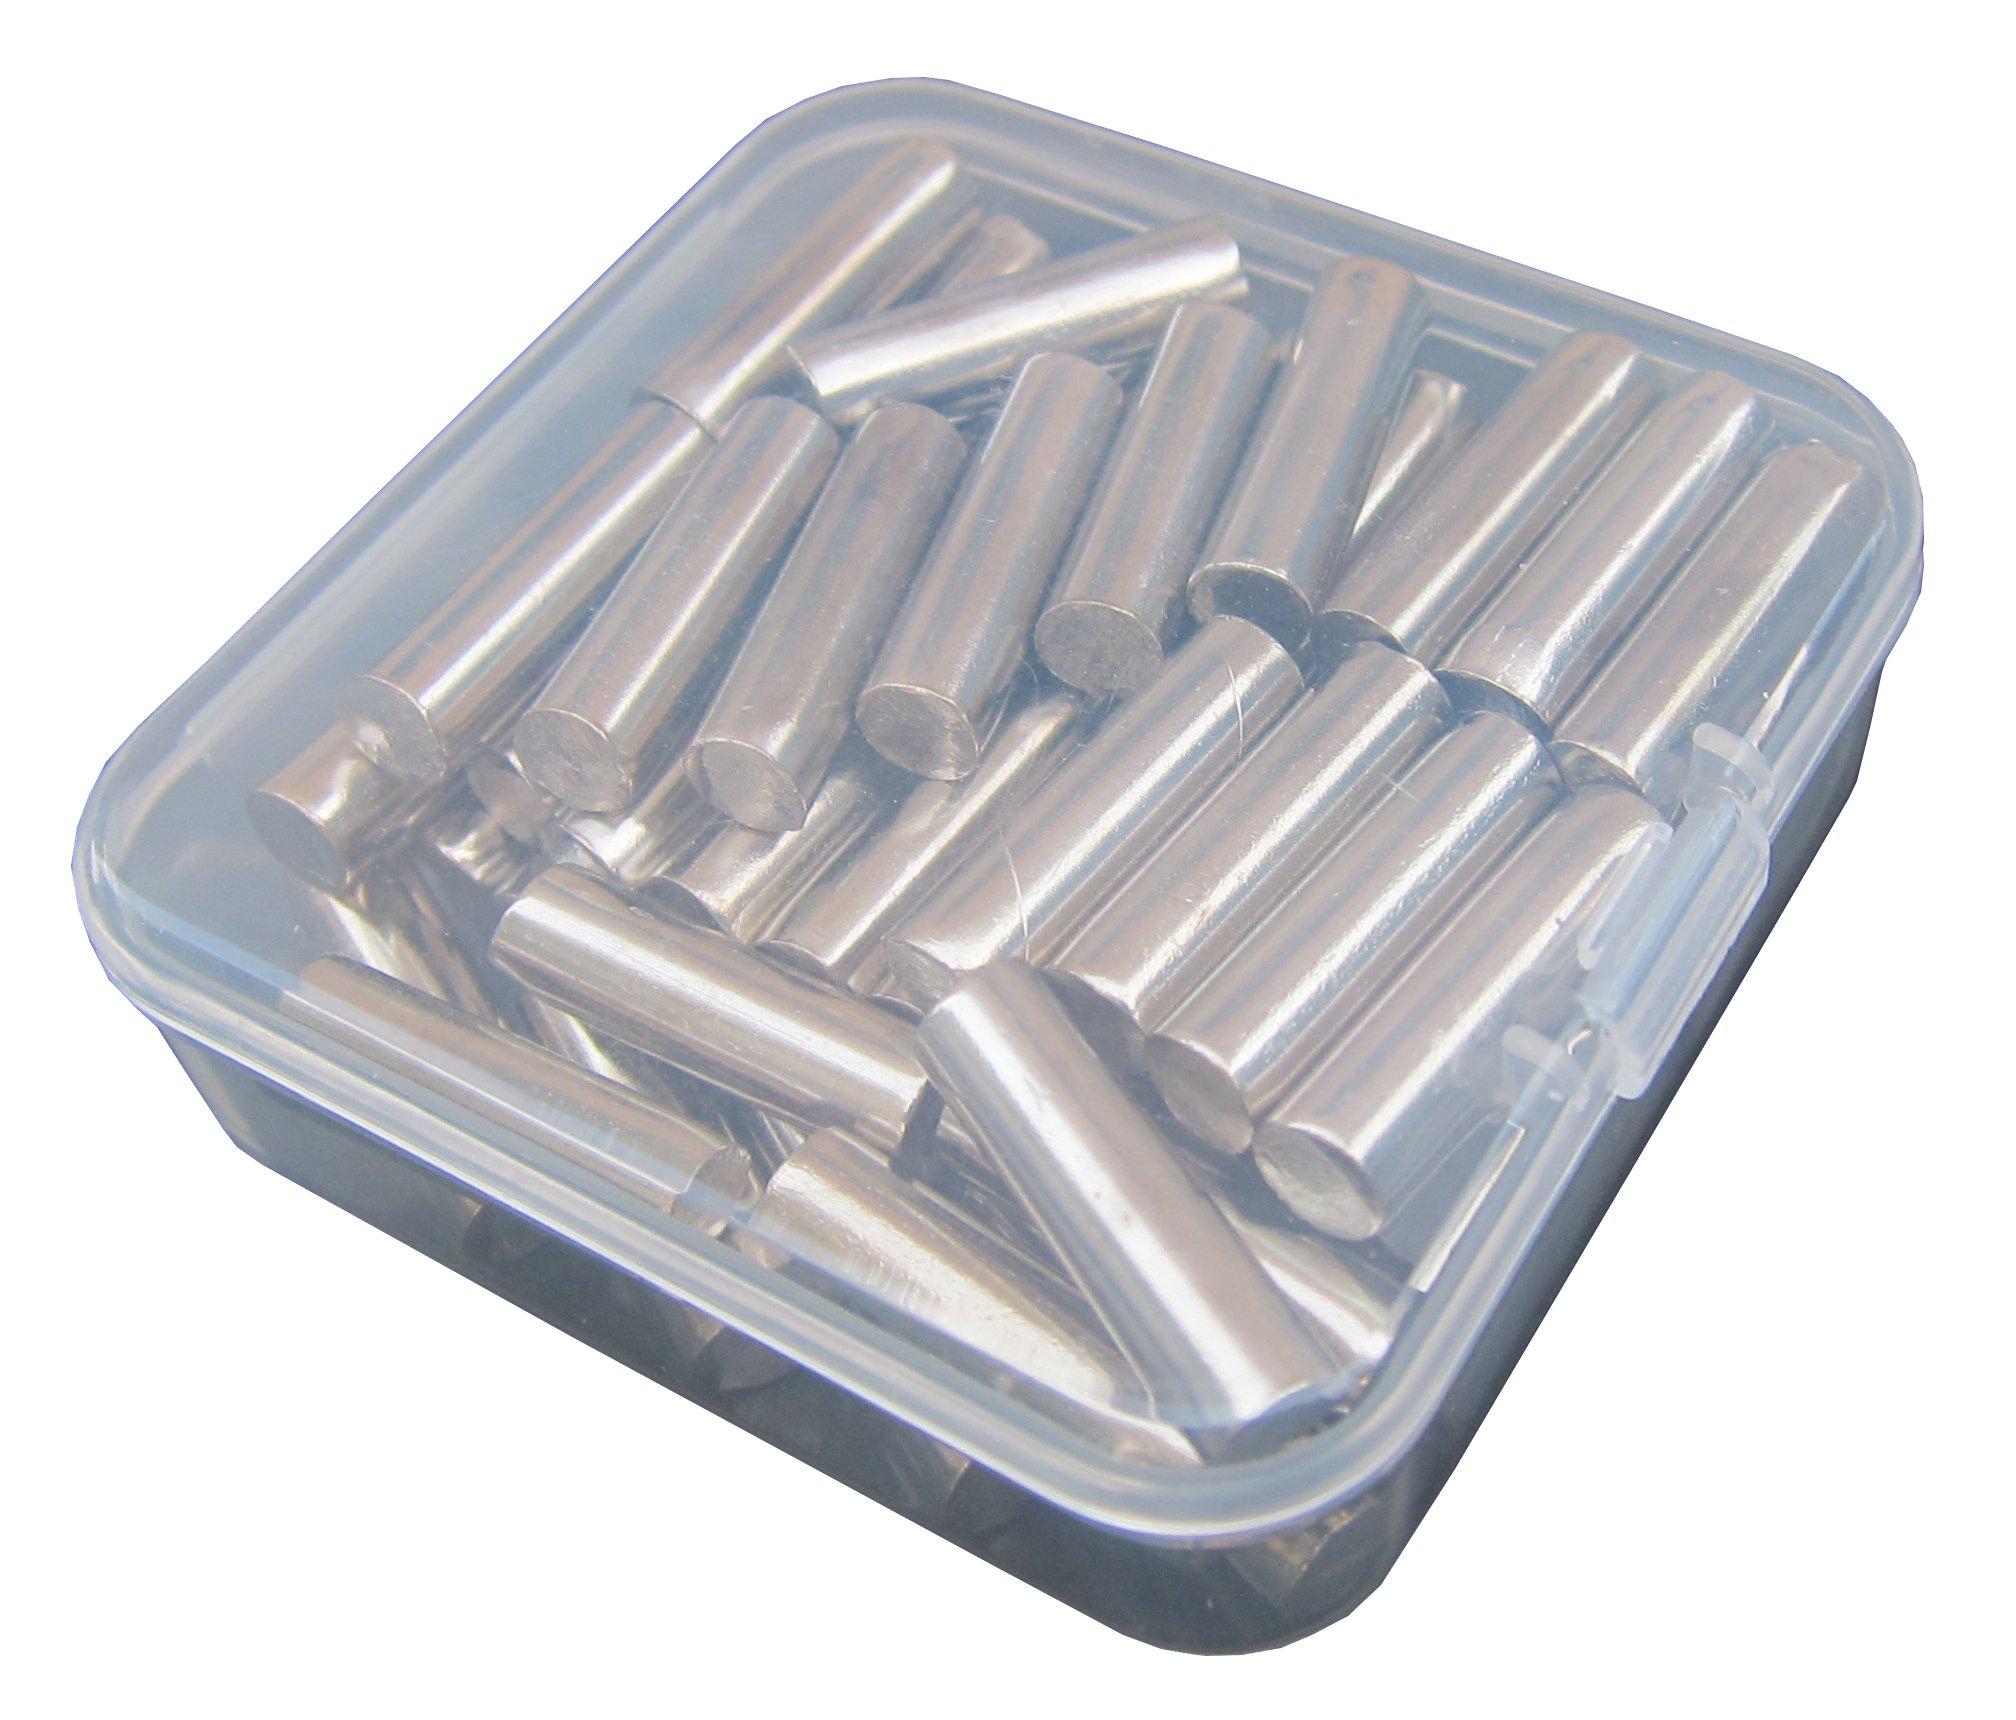 1/4-Inch Straight Rod Shelf Rests 60Piece Set, Furniture Cabinet Closet Shelf Pins, Dowel Pins in Storage Box, 60-Pack (Nickel)